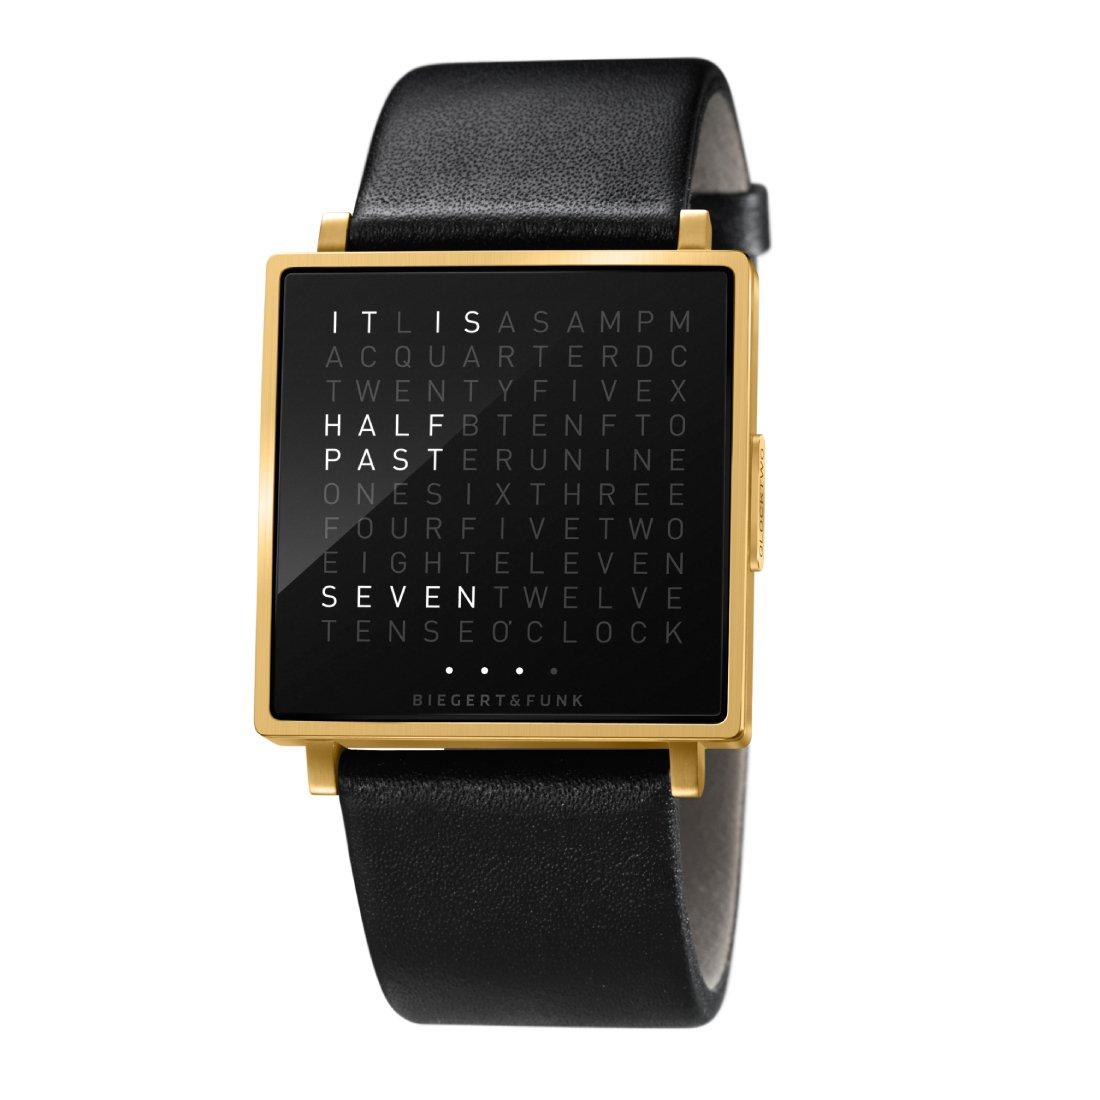 Biegert & Funk Qlocktwo W Horloge, Gold Edition